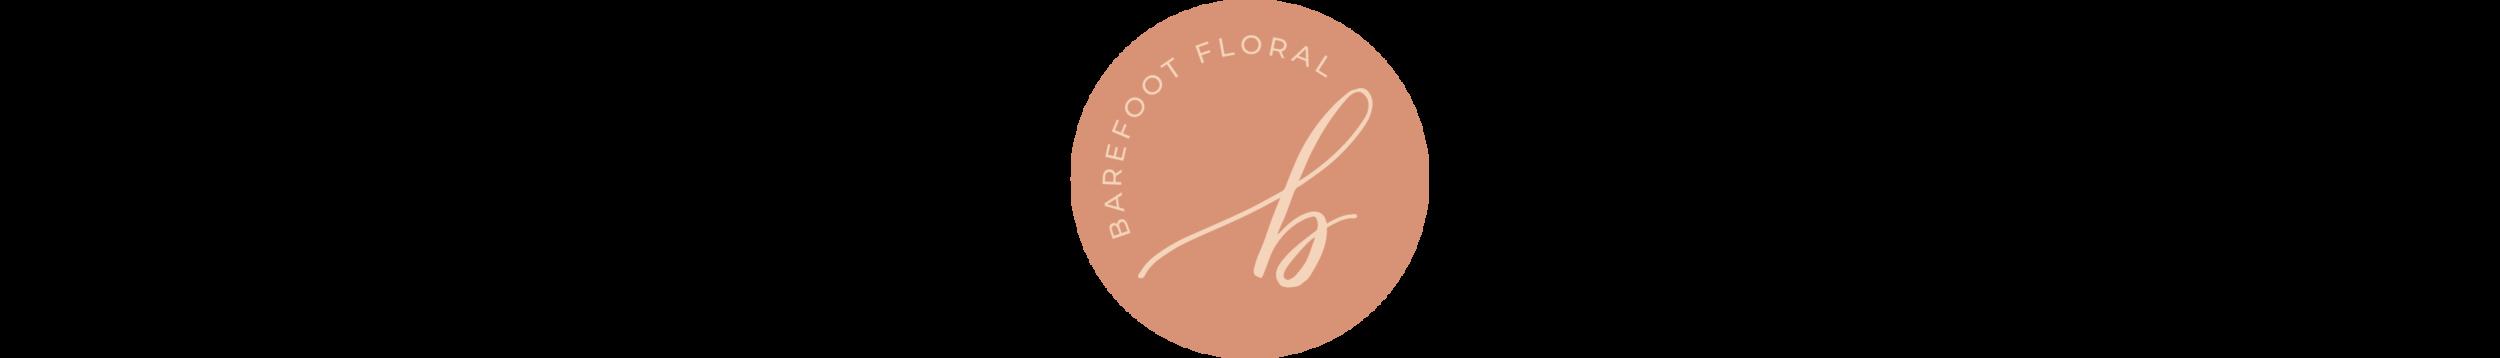 BFF-FooterLogo-02-01.png